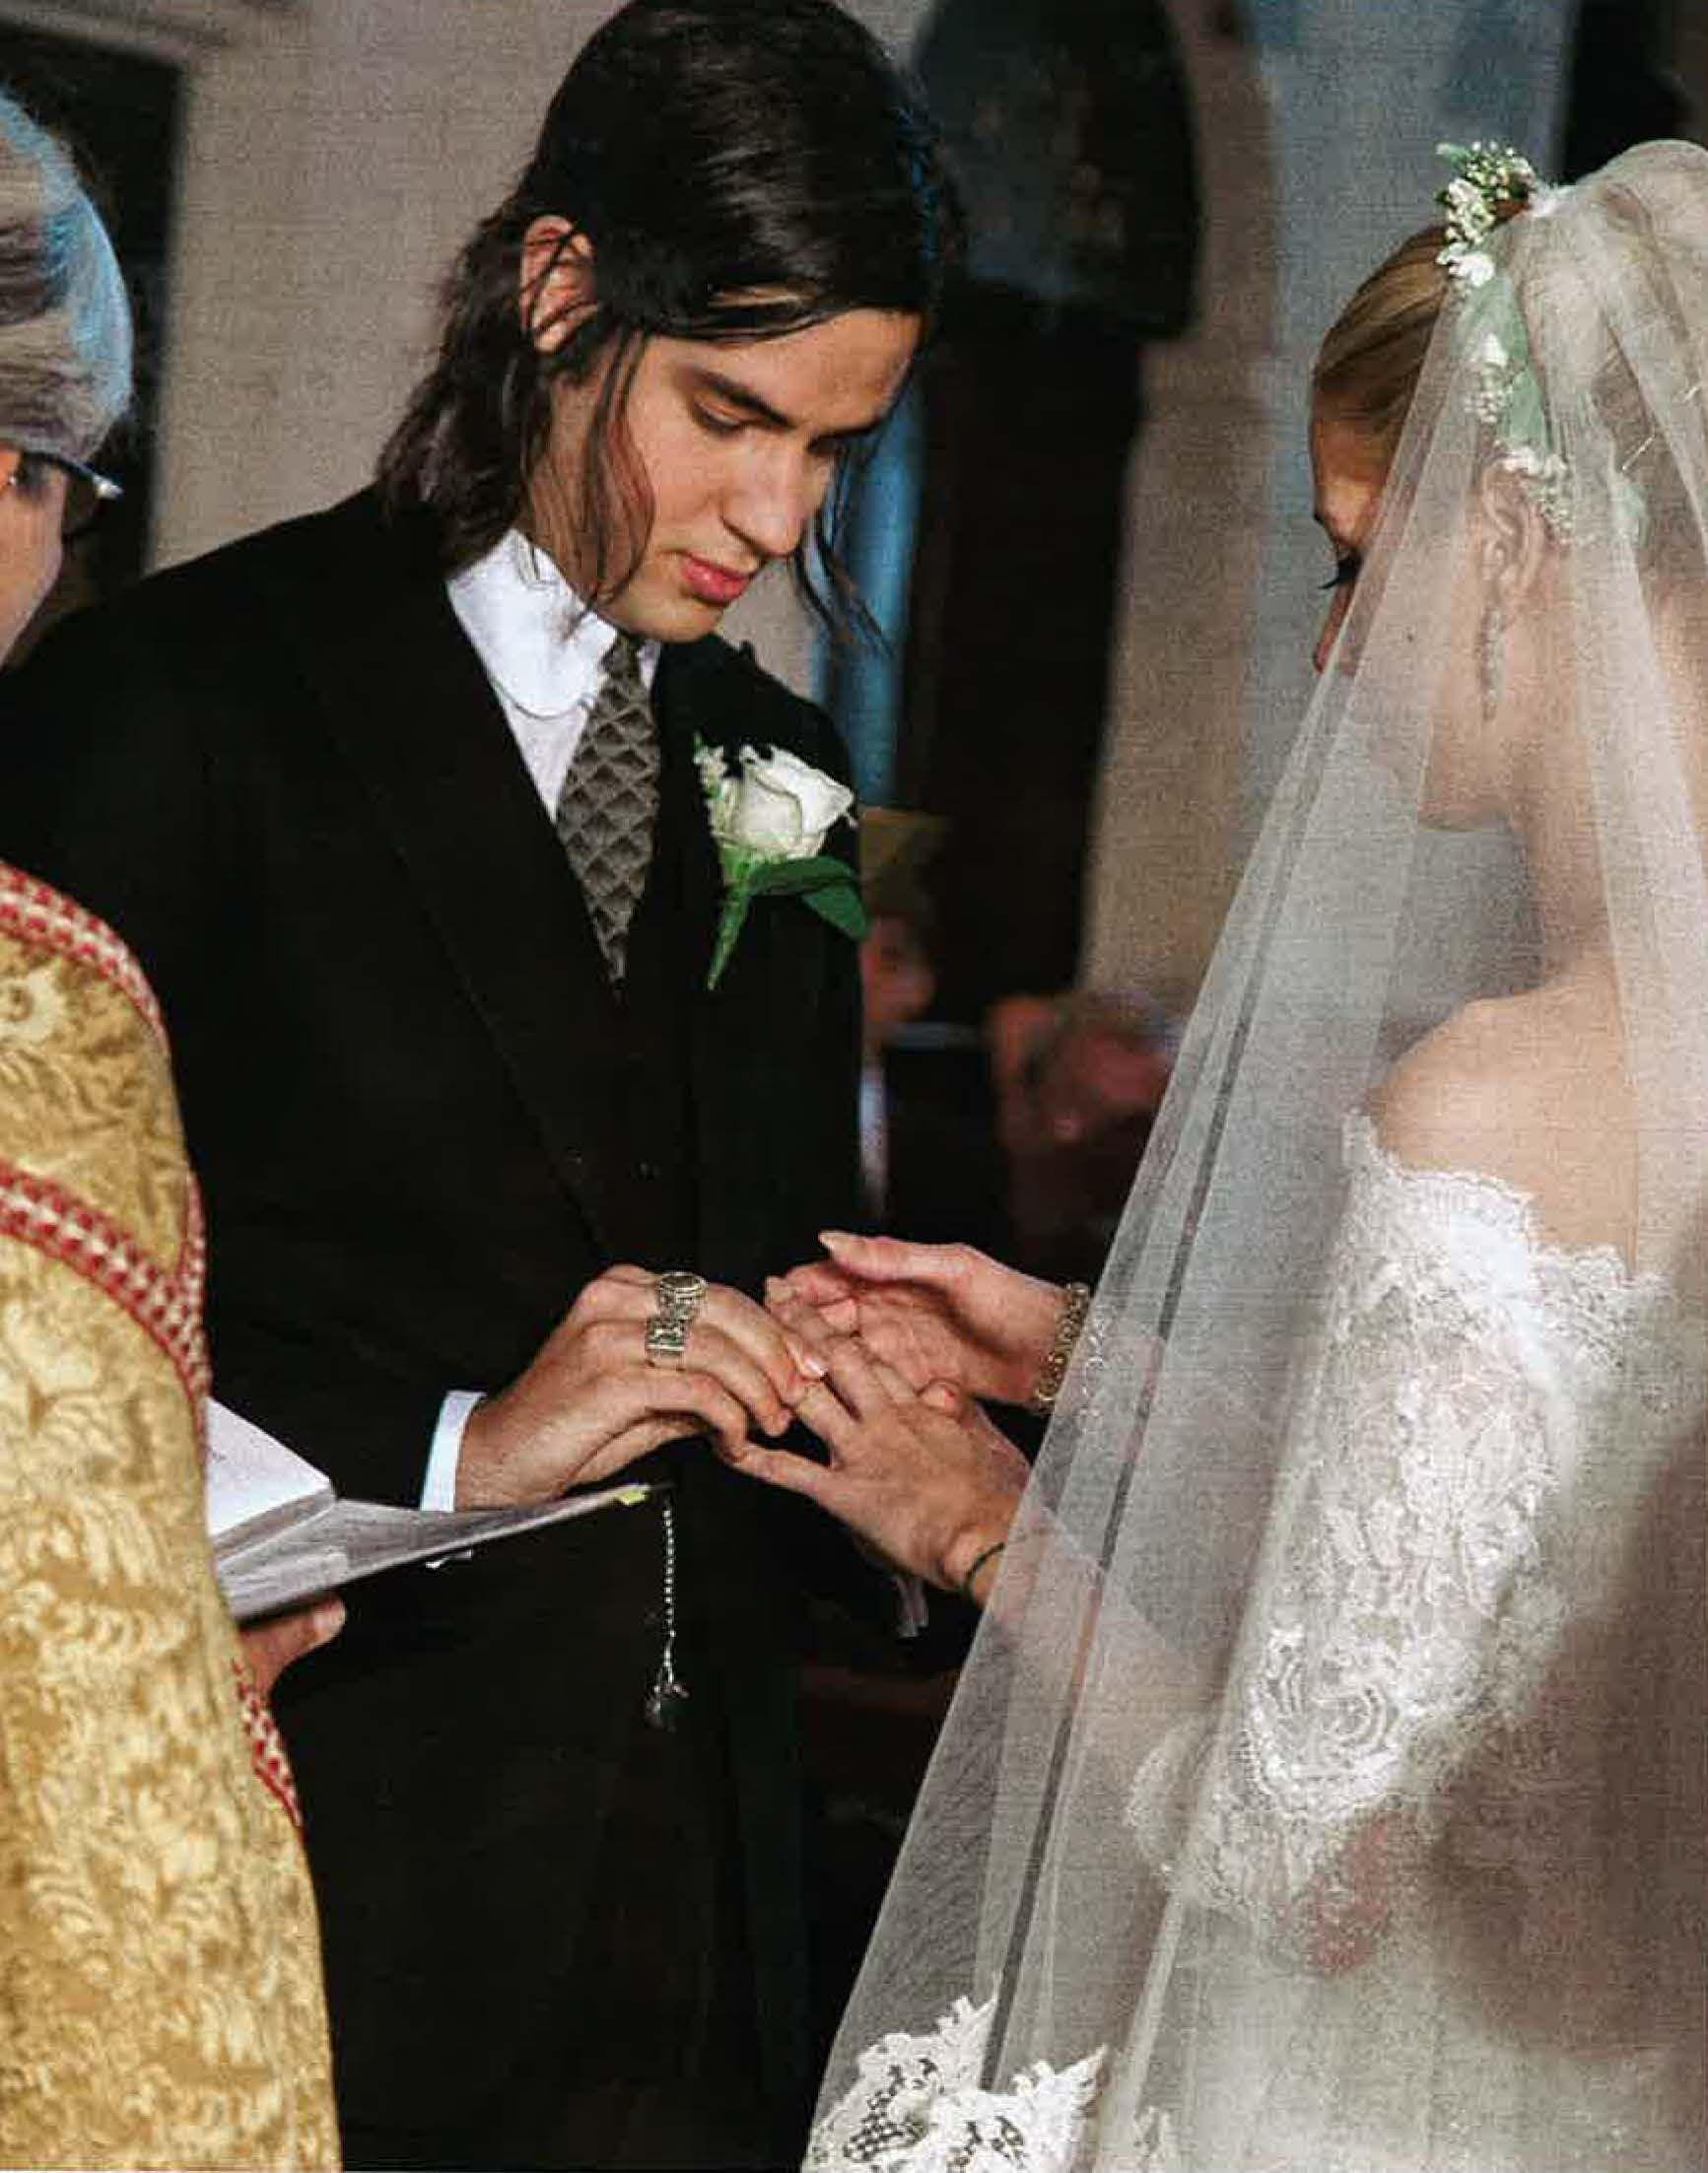 Peaches Geldof In Alberta Ferretti Wedding Dress